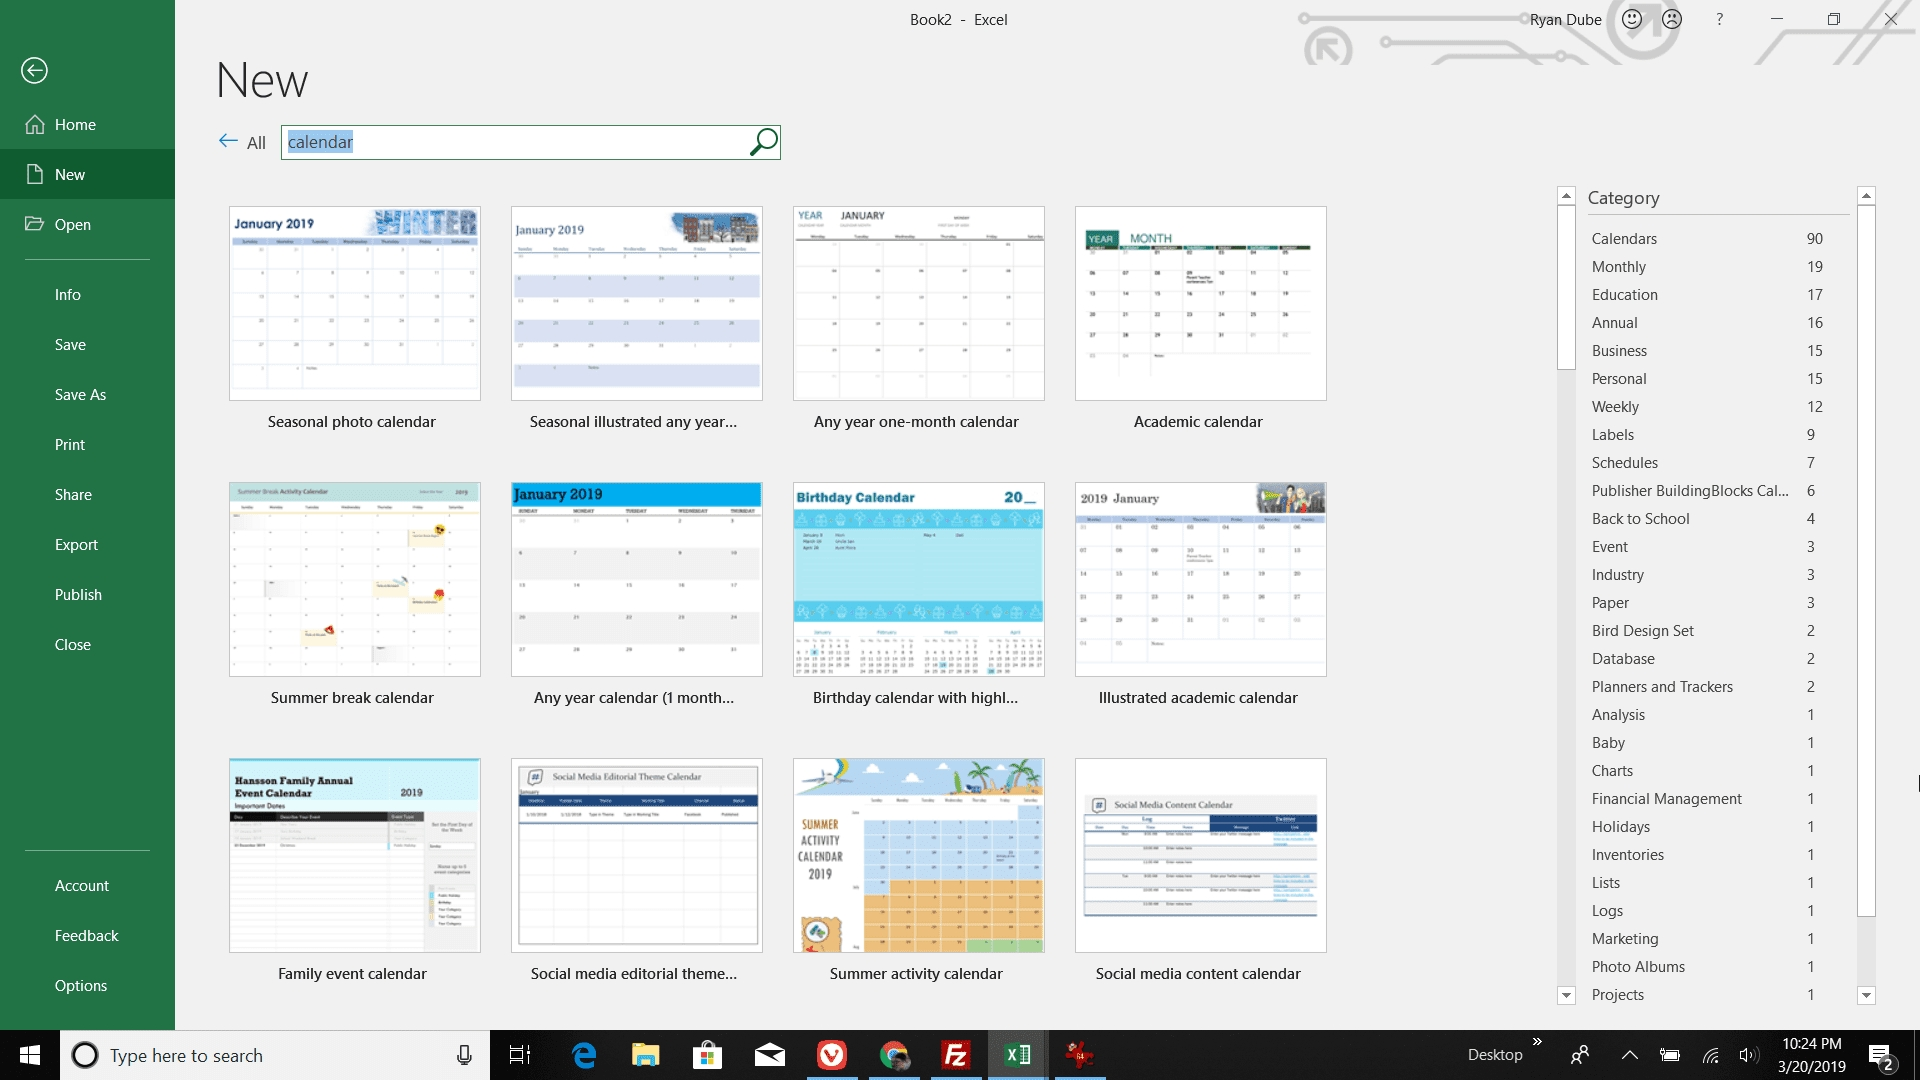 How To Make A Calendar In Excel Create A Calendar Printable In Excel